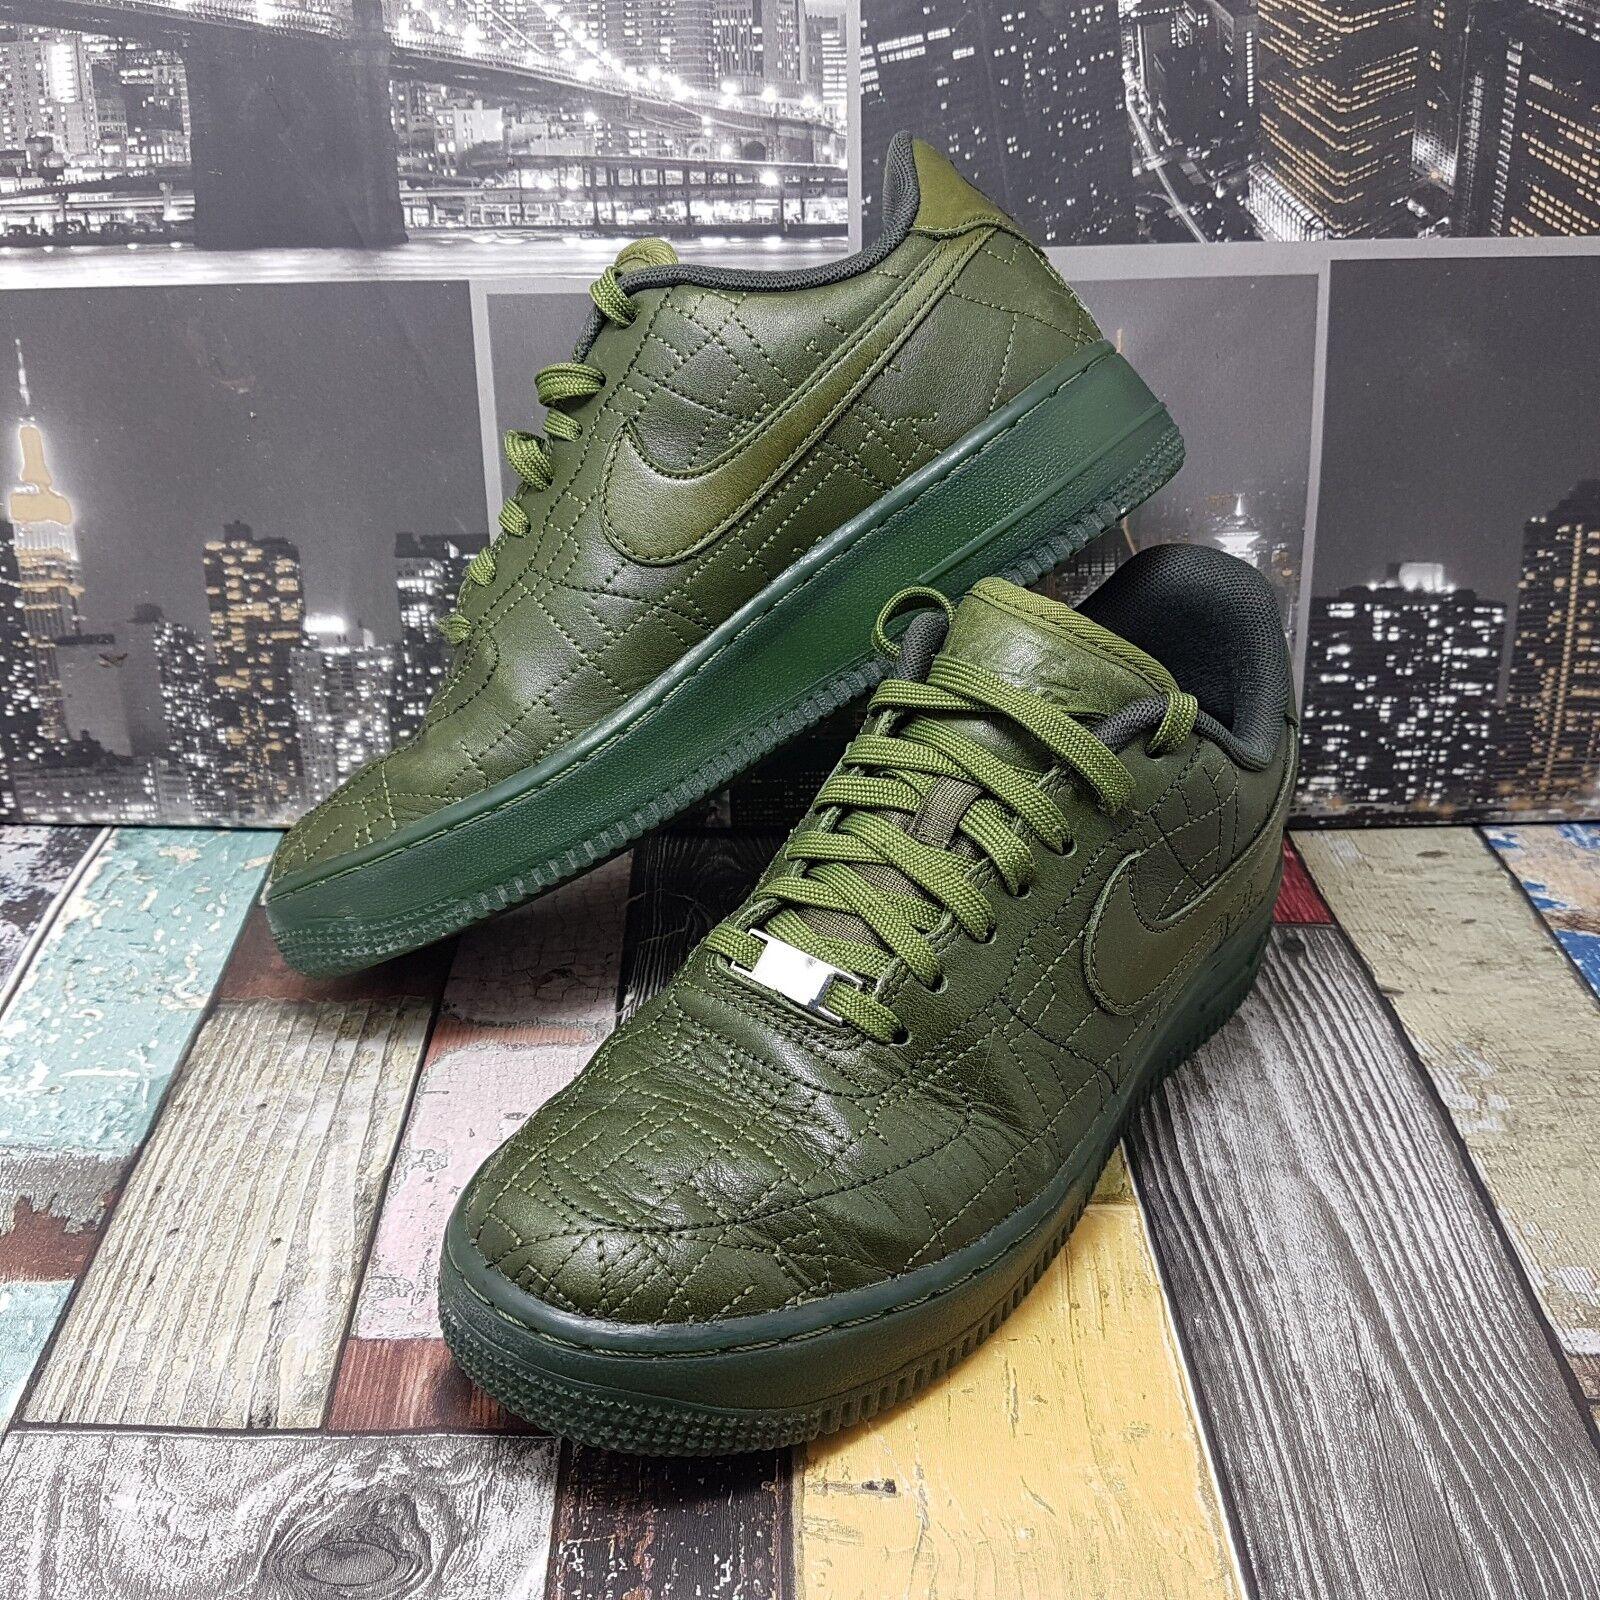 Para mujer Nike Air Force 1 07 07 07 FW QS London Zapatillas Talla 5 Khaki Cuero EU 38.5  diseñador en linea